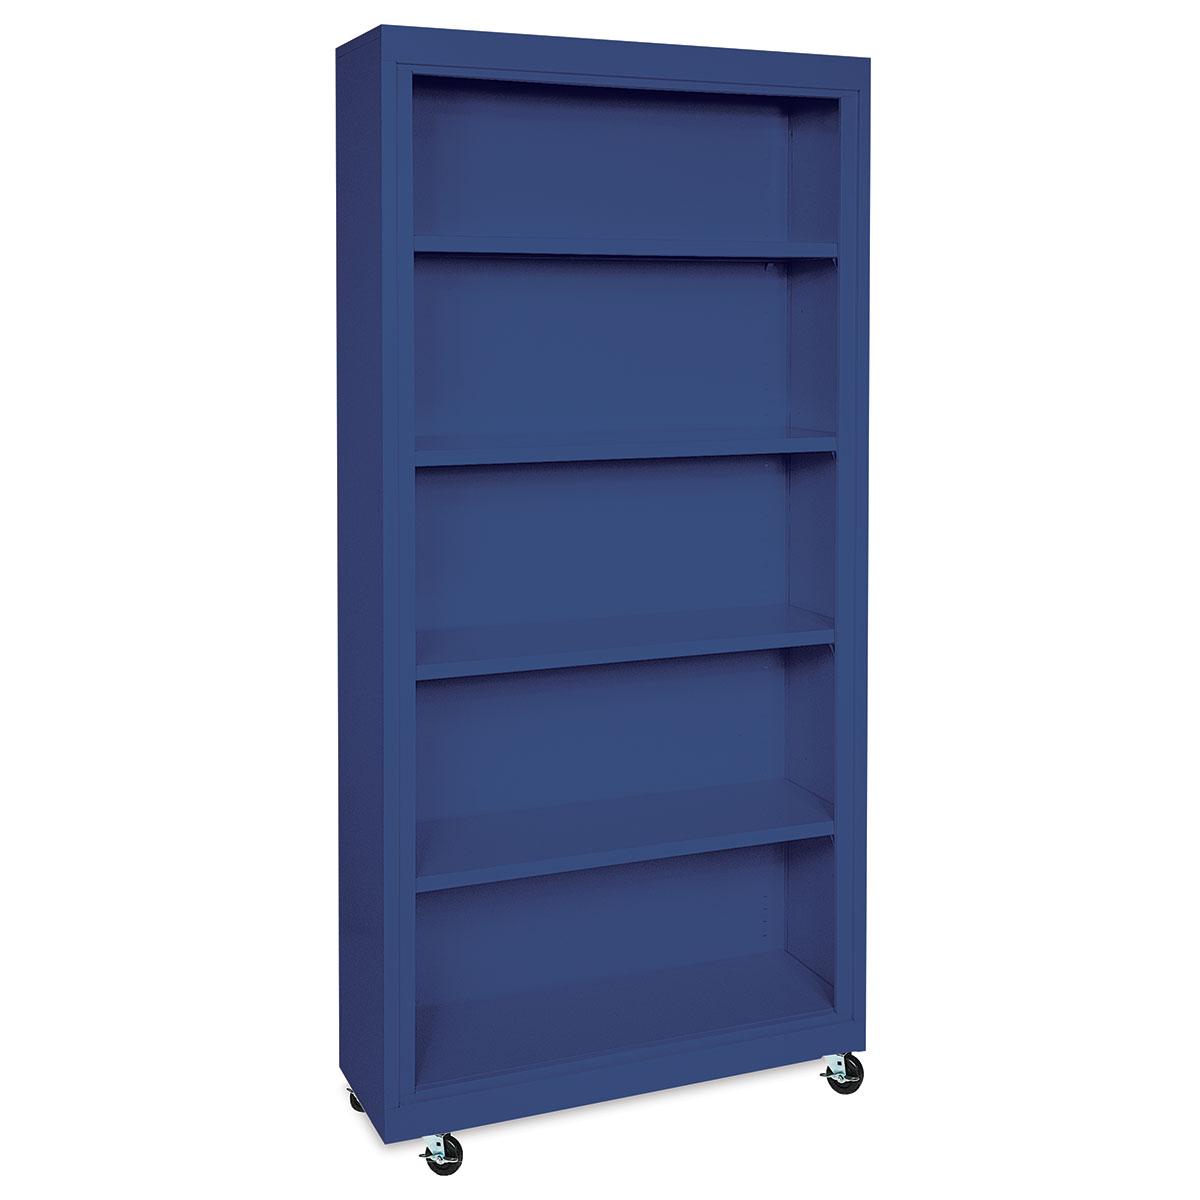 Sandusky Lee Mobile Bookcase - 36 x 78 x 18, Blue